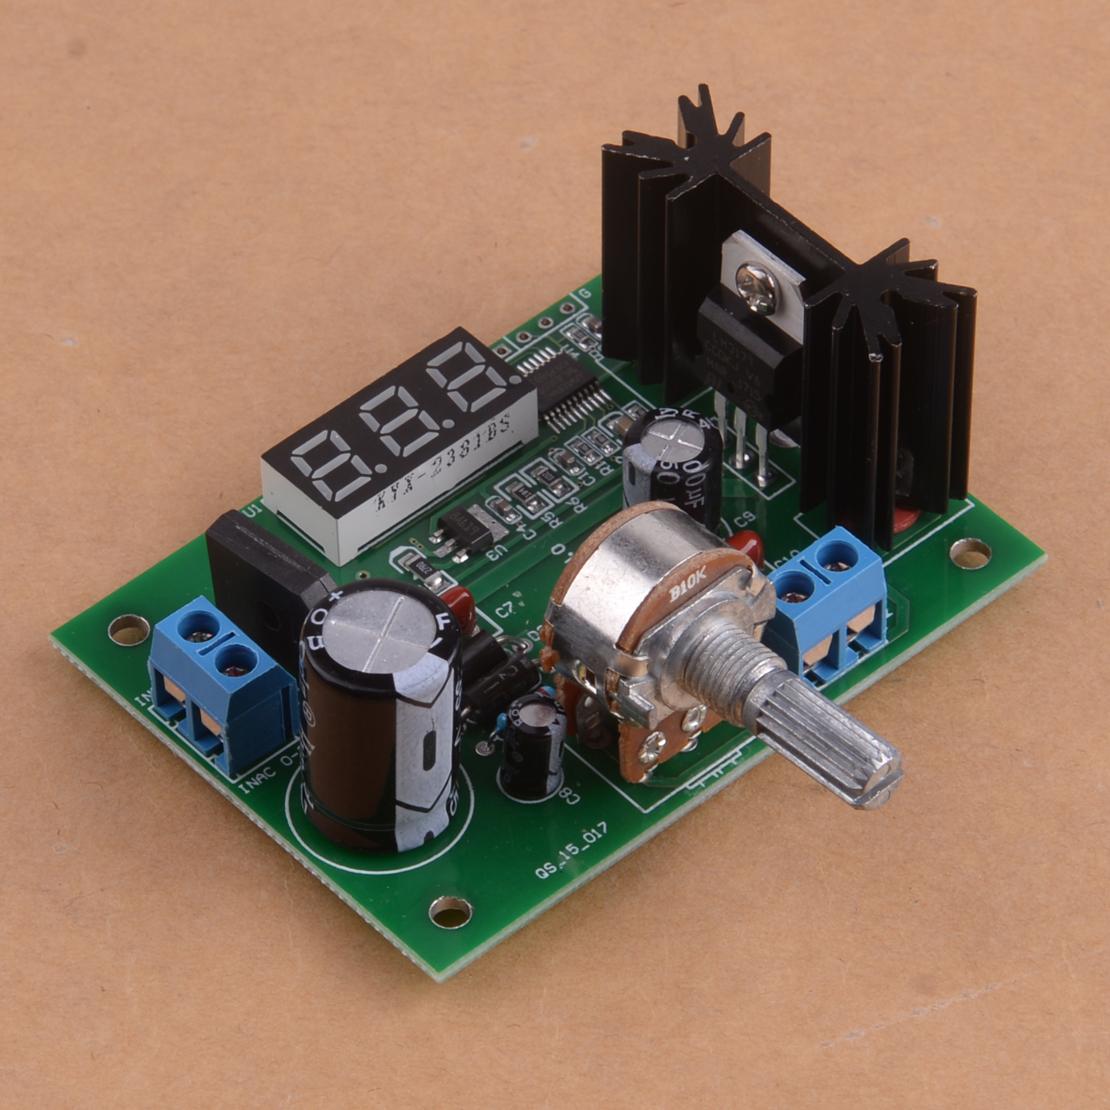 LM317 Adjustable Voltage Regulator Step down Power Supply Module LED Display